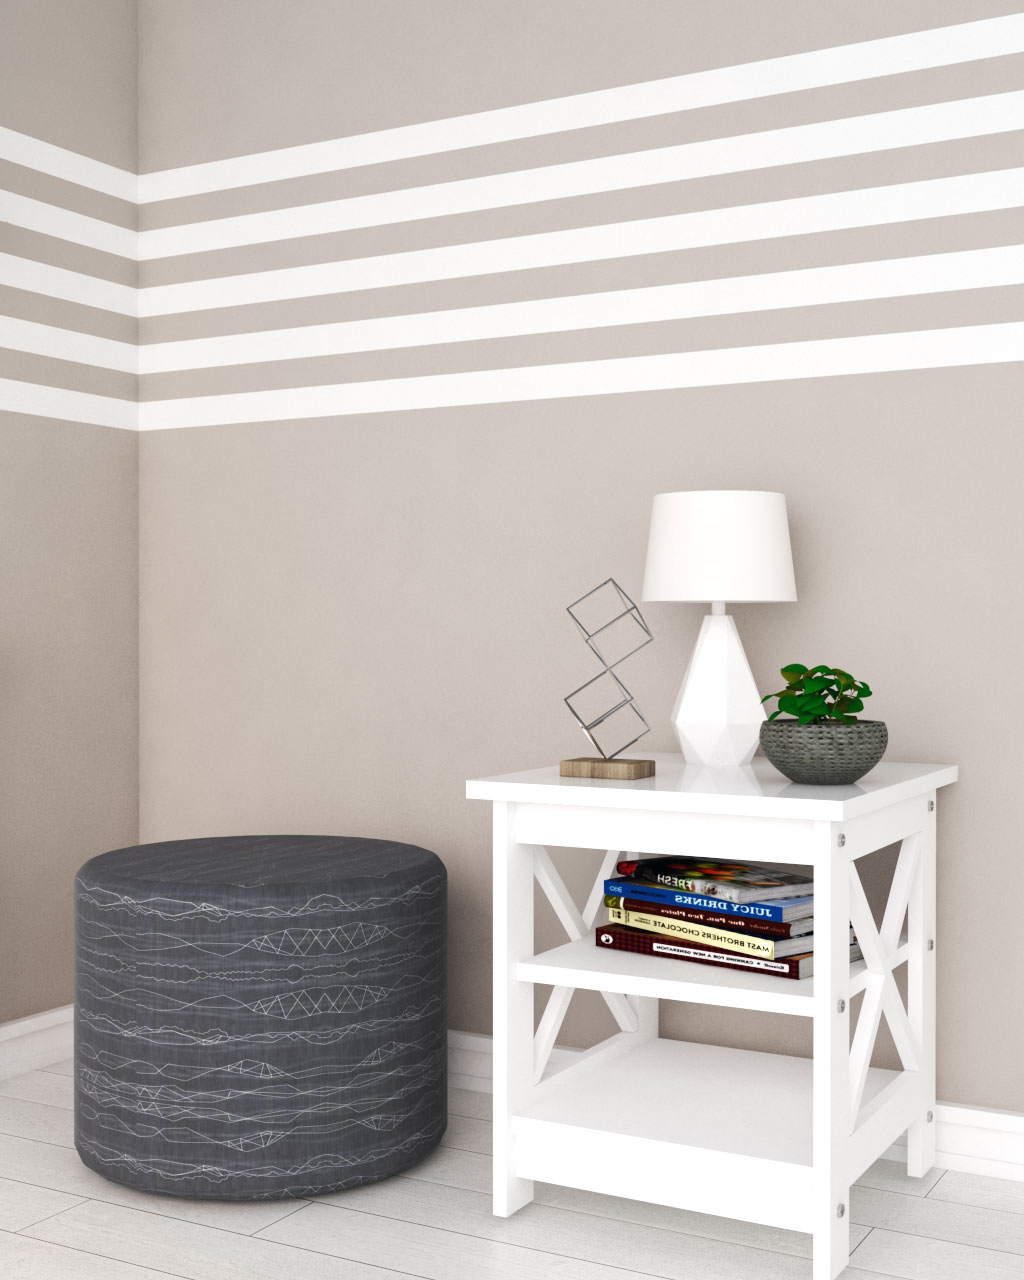 Horizontal Striped Wall Paint Ideas